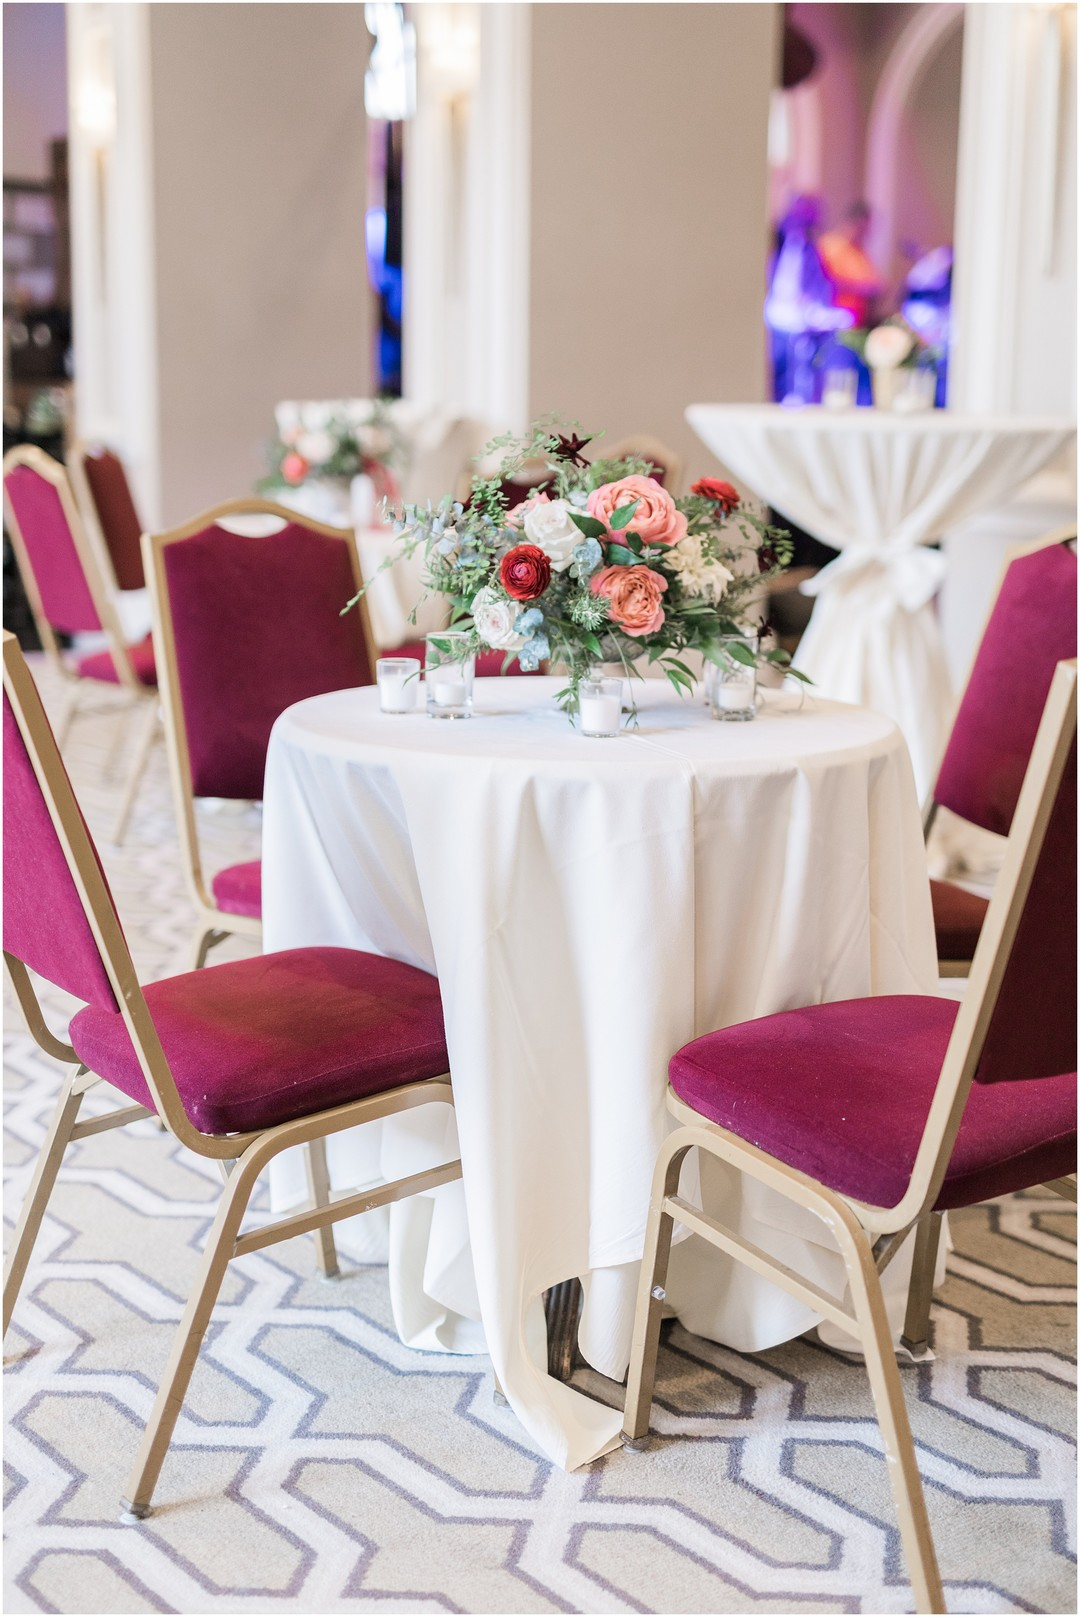 mills-house-hotel-wedding-34.jpg